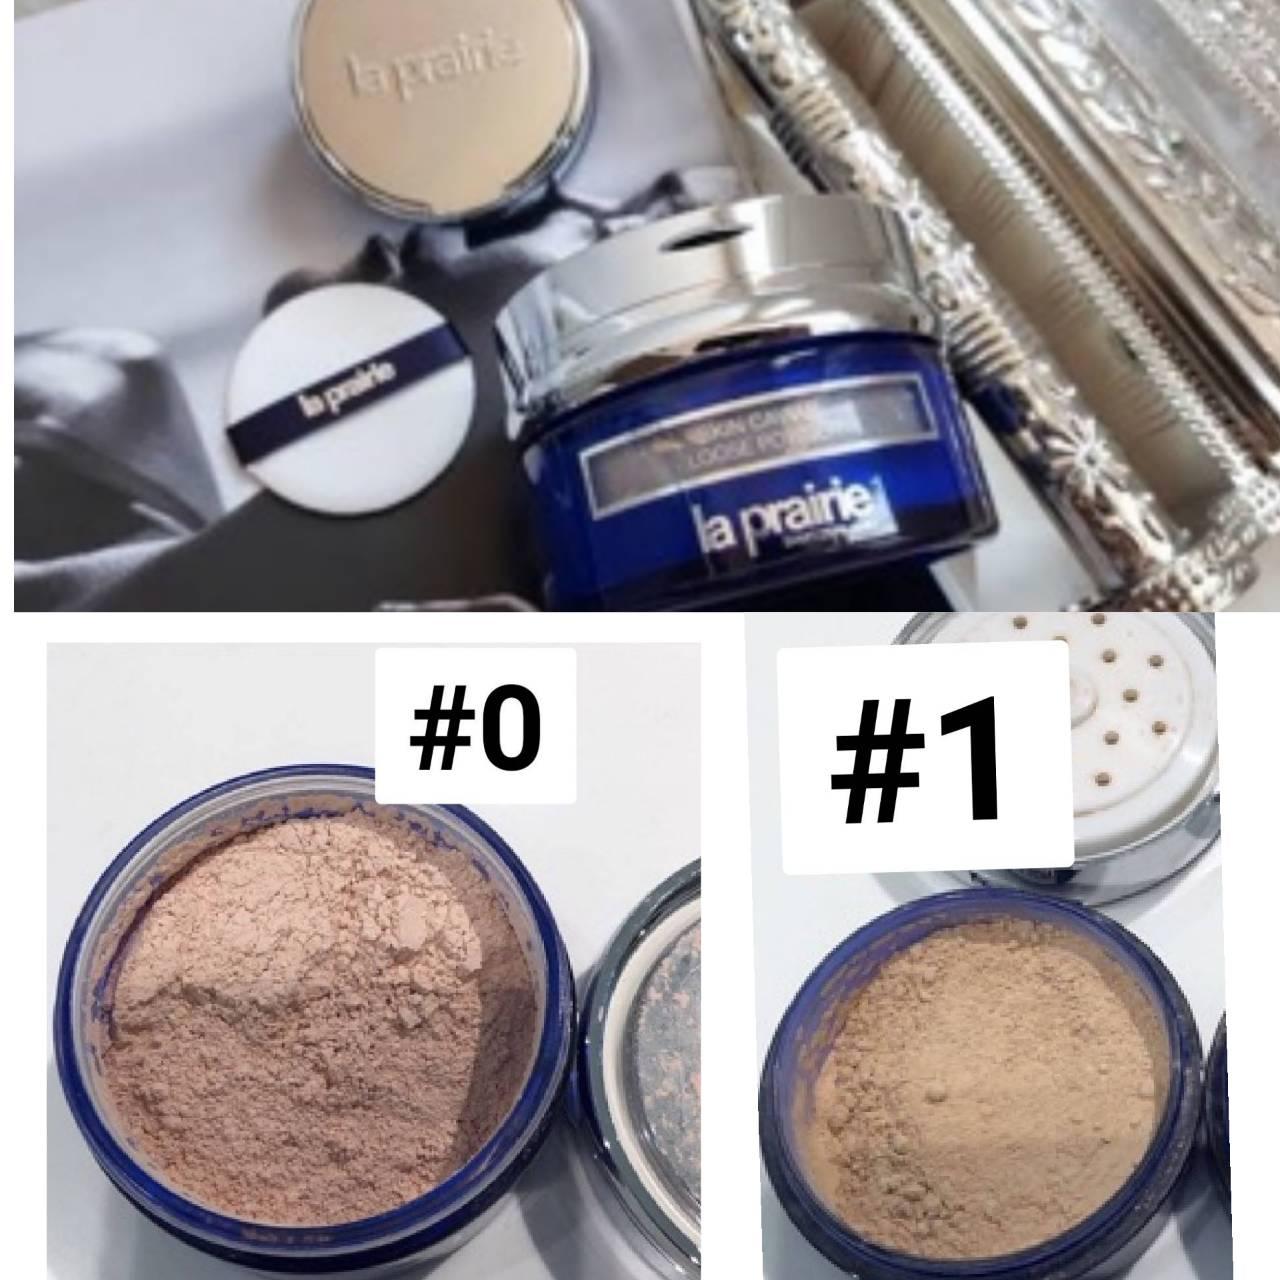 LA PRAIRIE  แป้งฝุ่น Skin Caviar Loose Powder 15G.มีให้เลือก 2 เบอร์โปรดระบุ 1